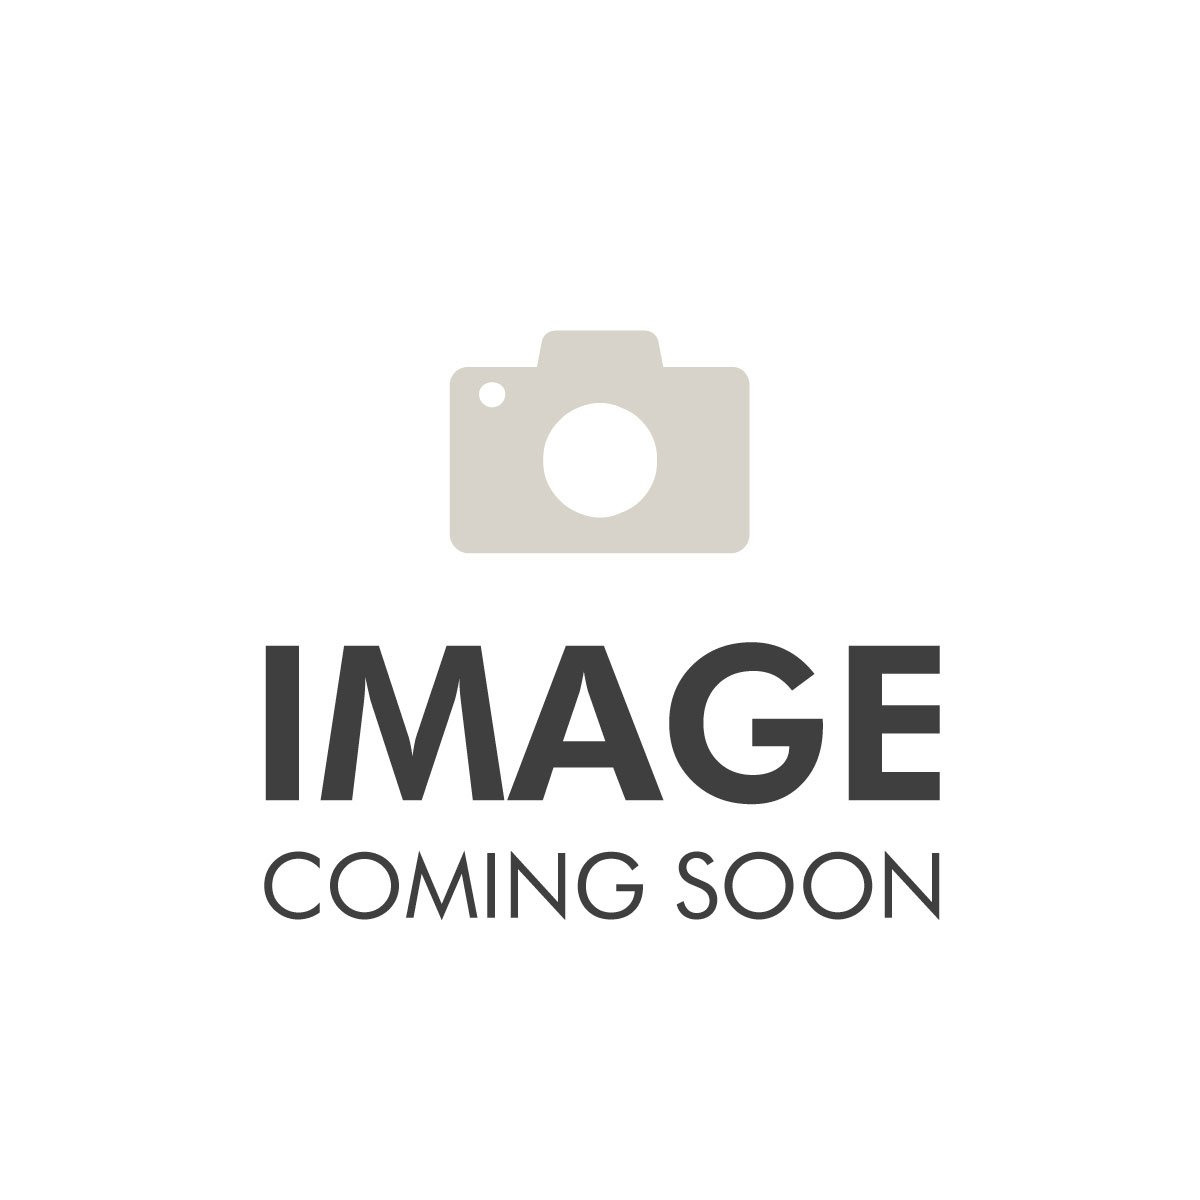 BG - Poignée Hongroise